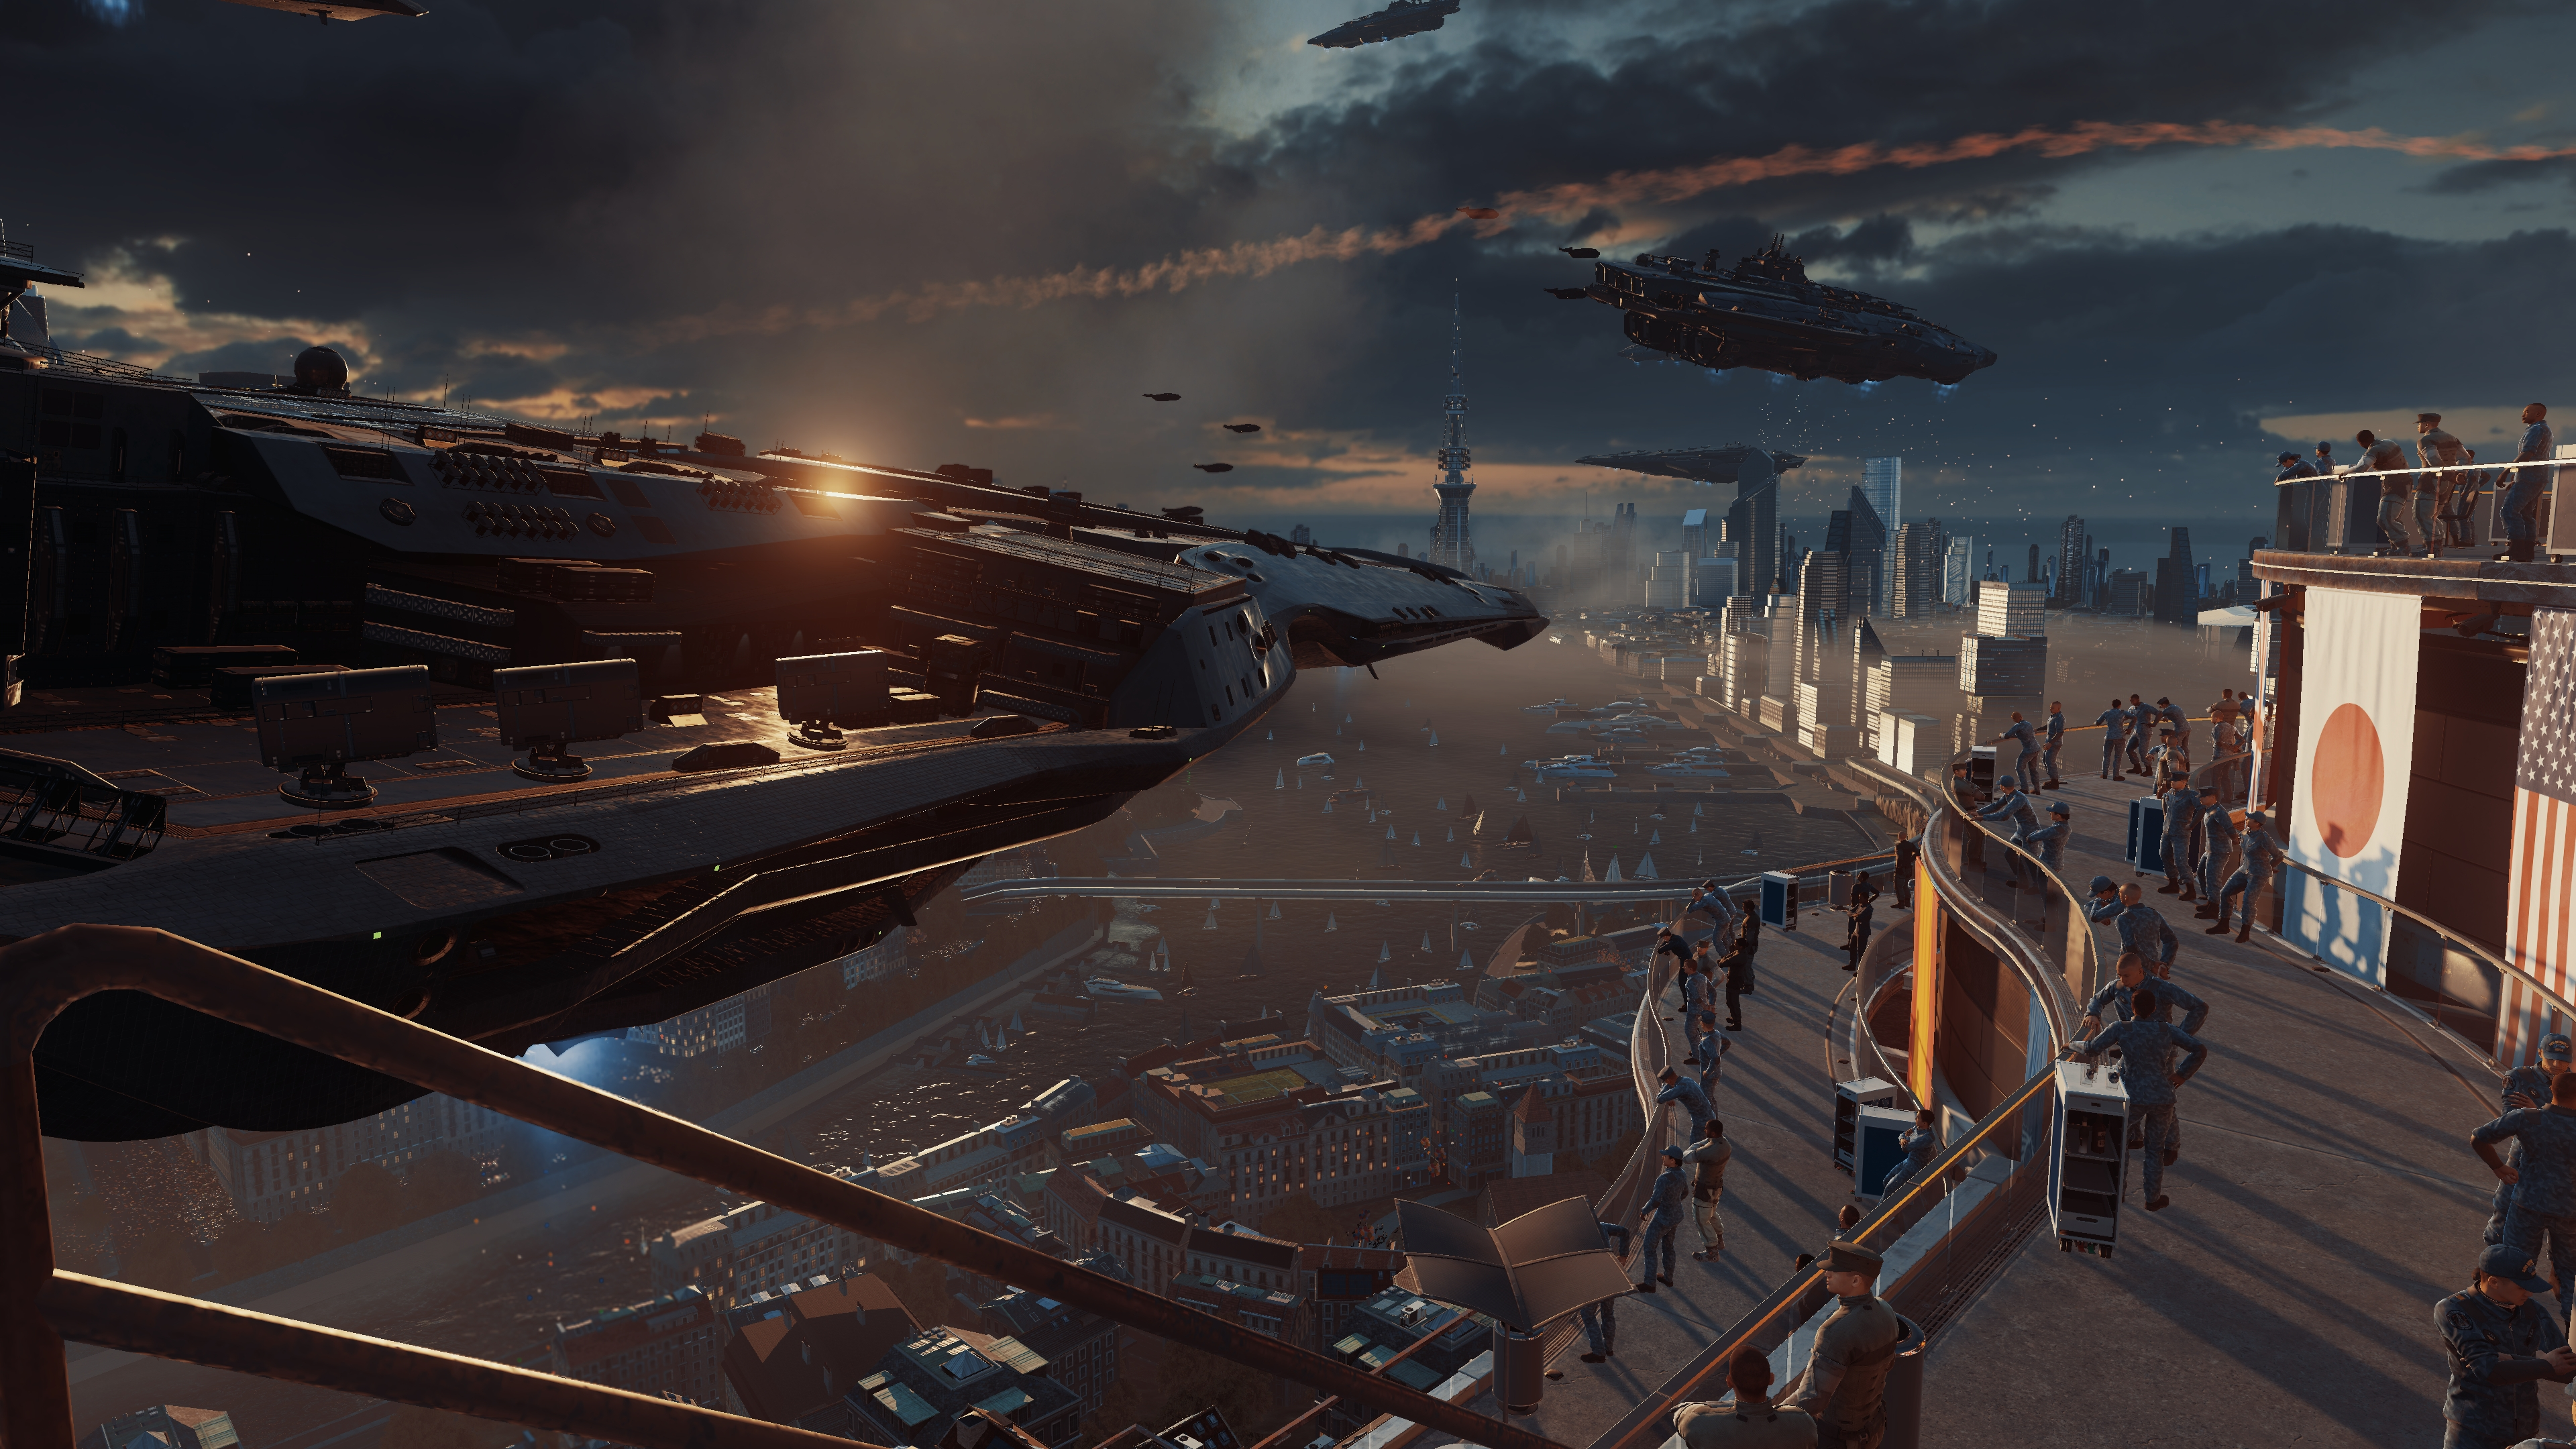 Cod Infinite Warfare Wallpaper: Call Of Duty: Infinite Warfare Wallpapers, Pictures, Images